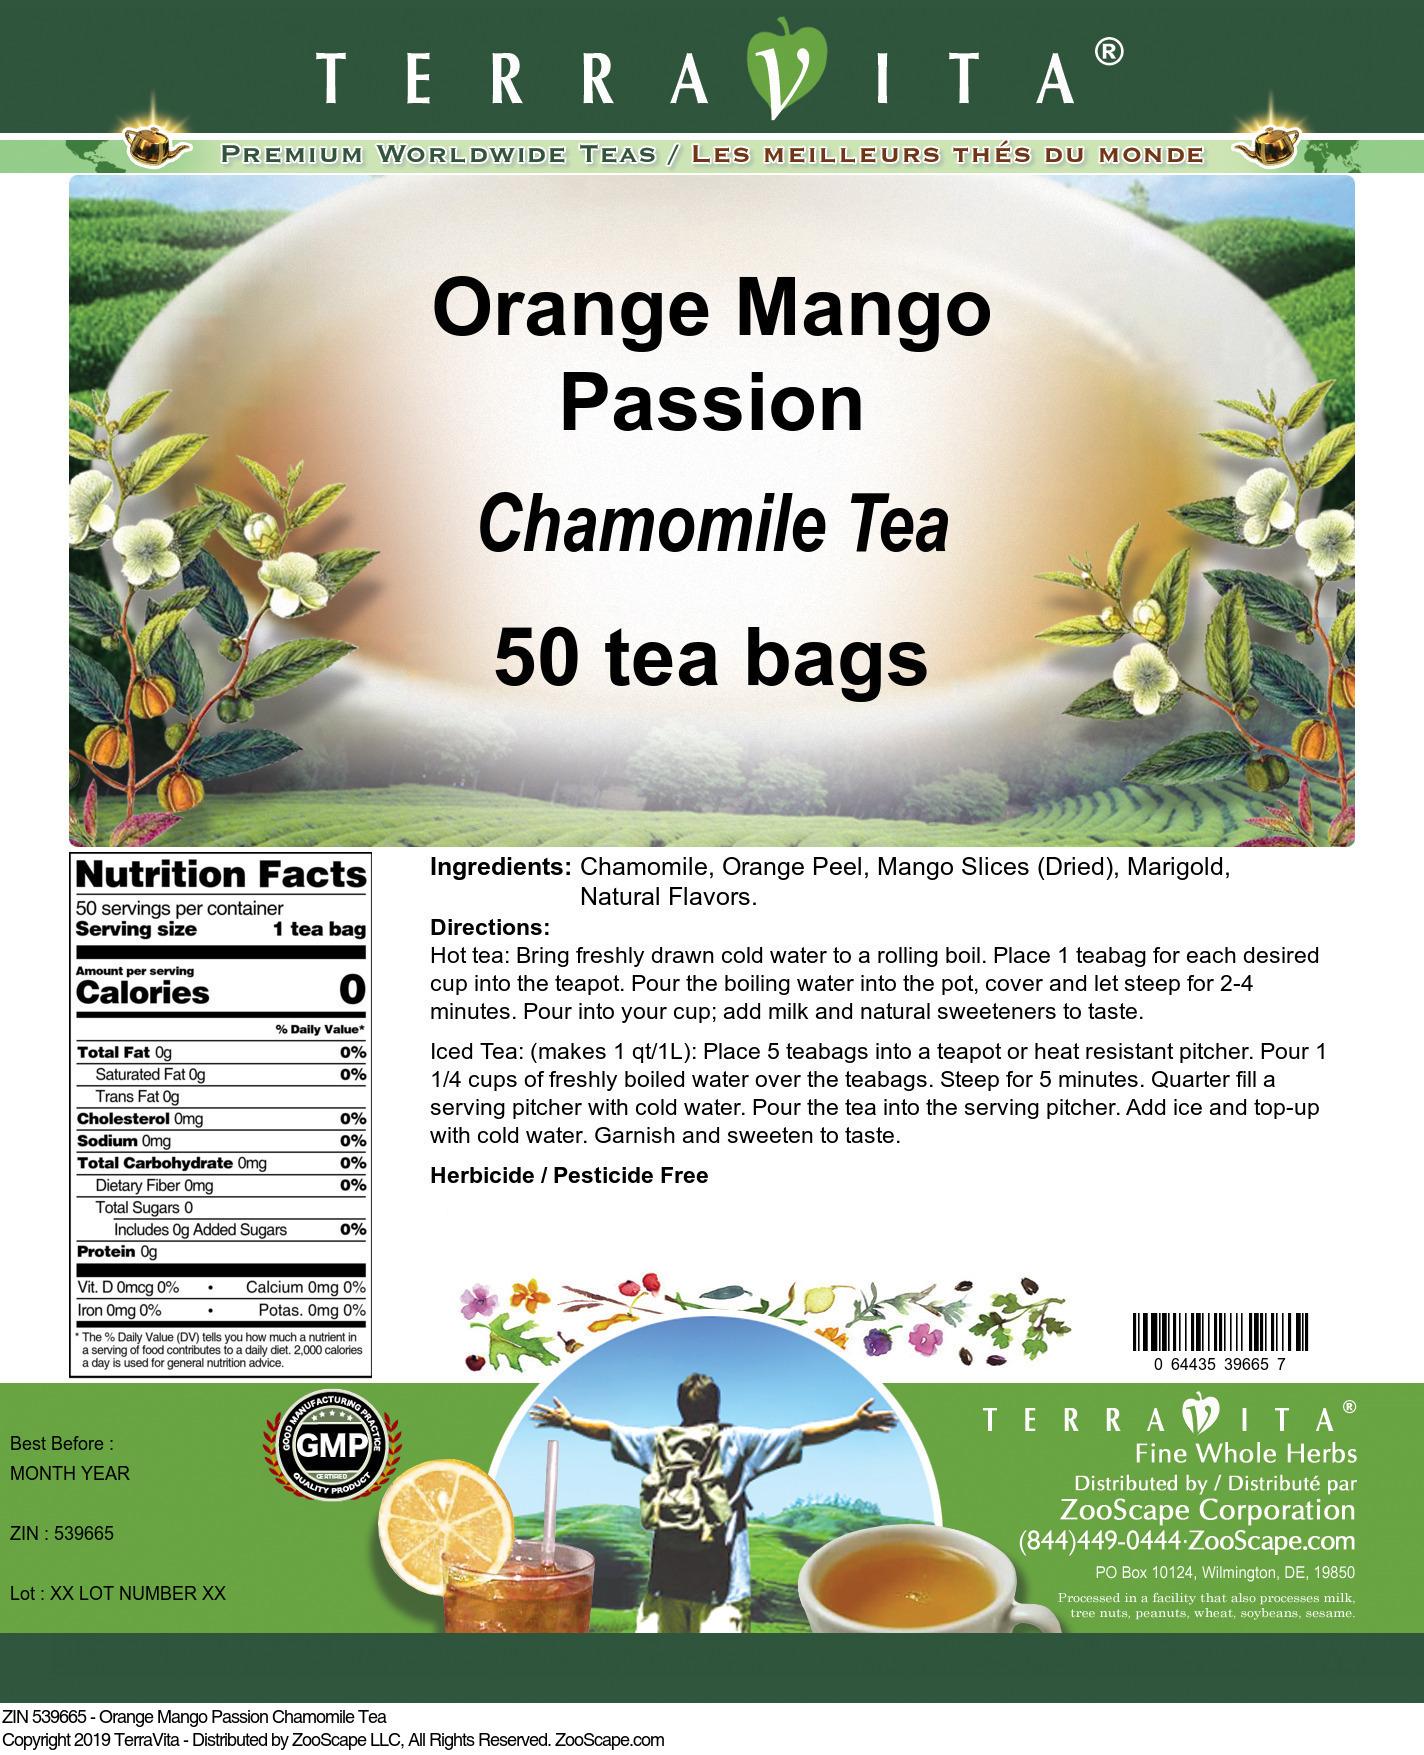 Orange Mango Passion Chamomile Tea